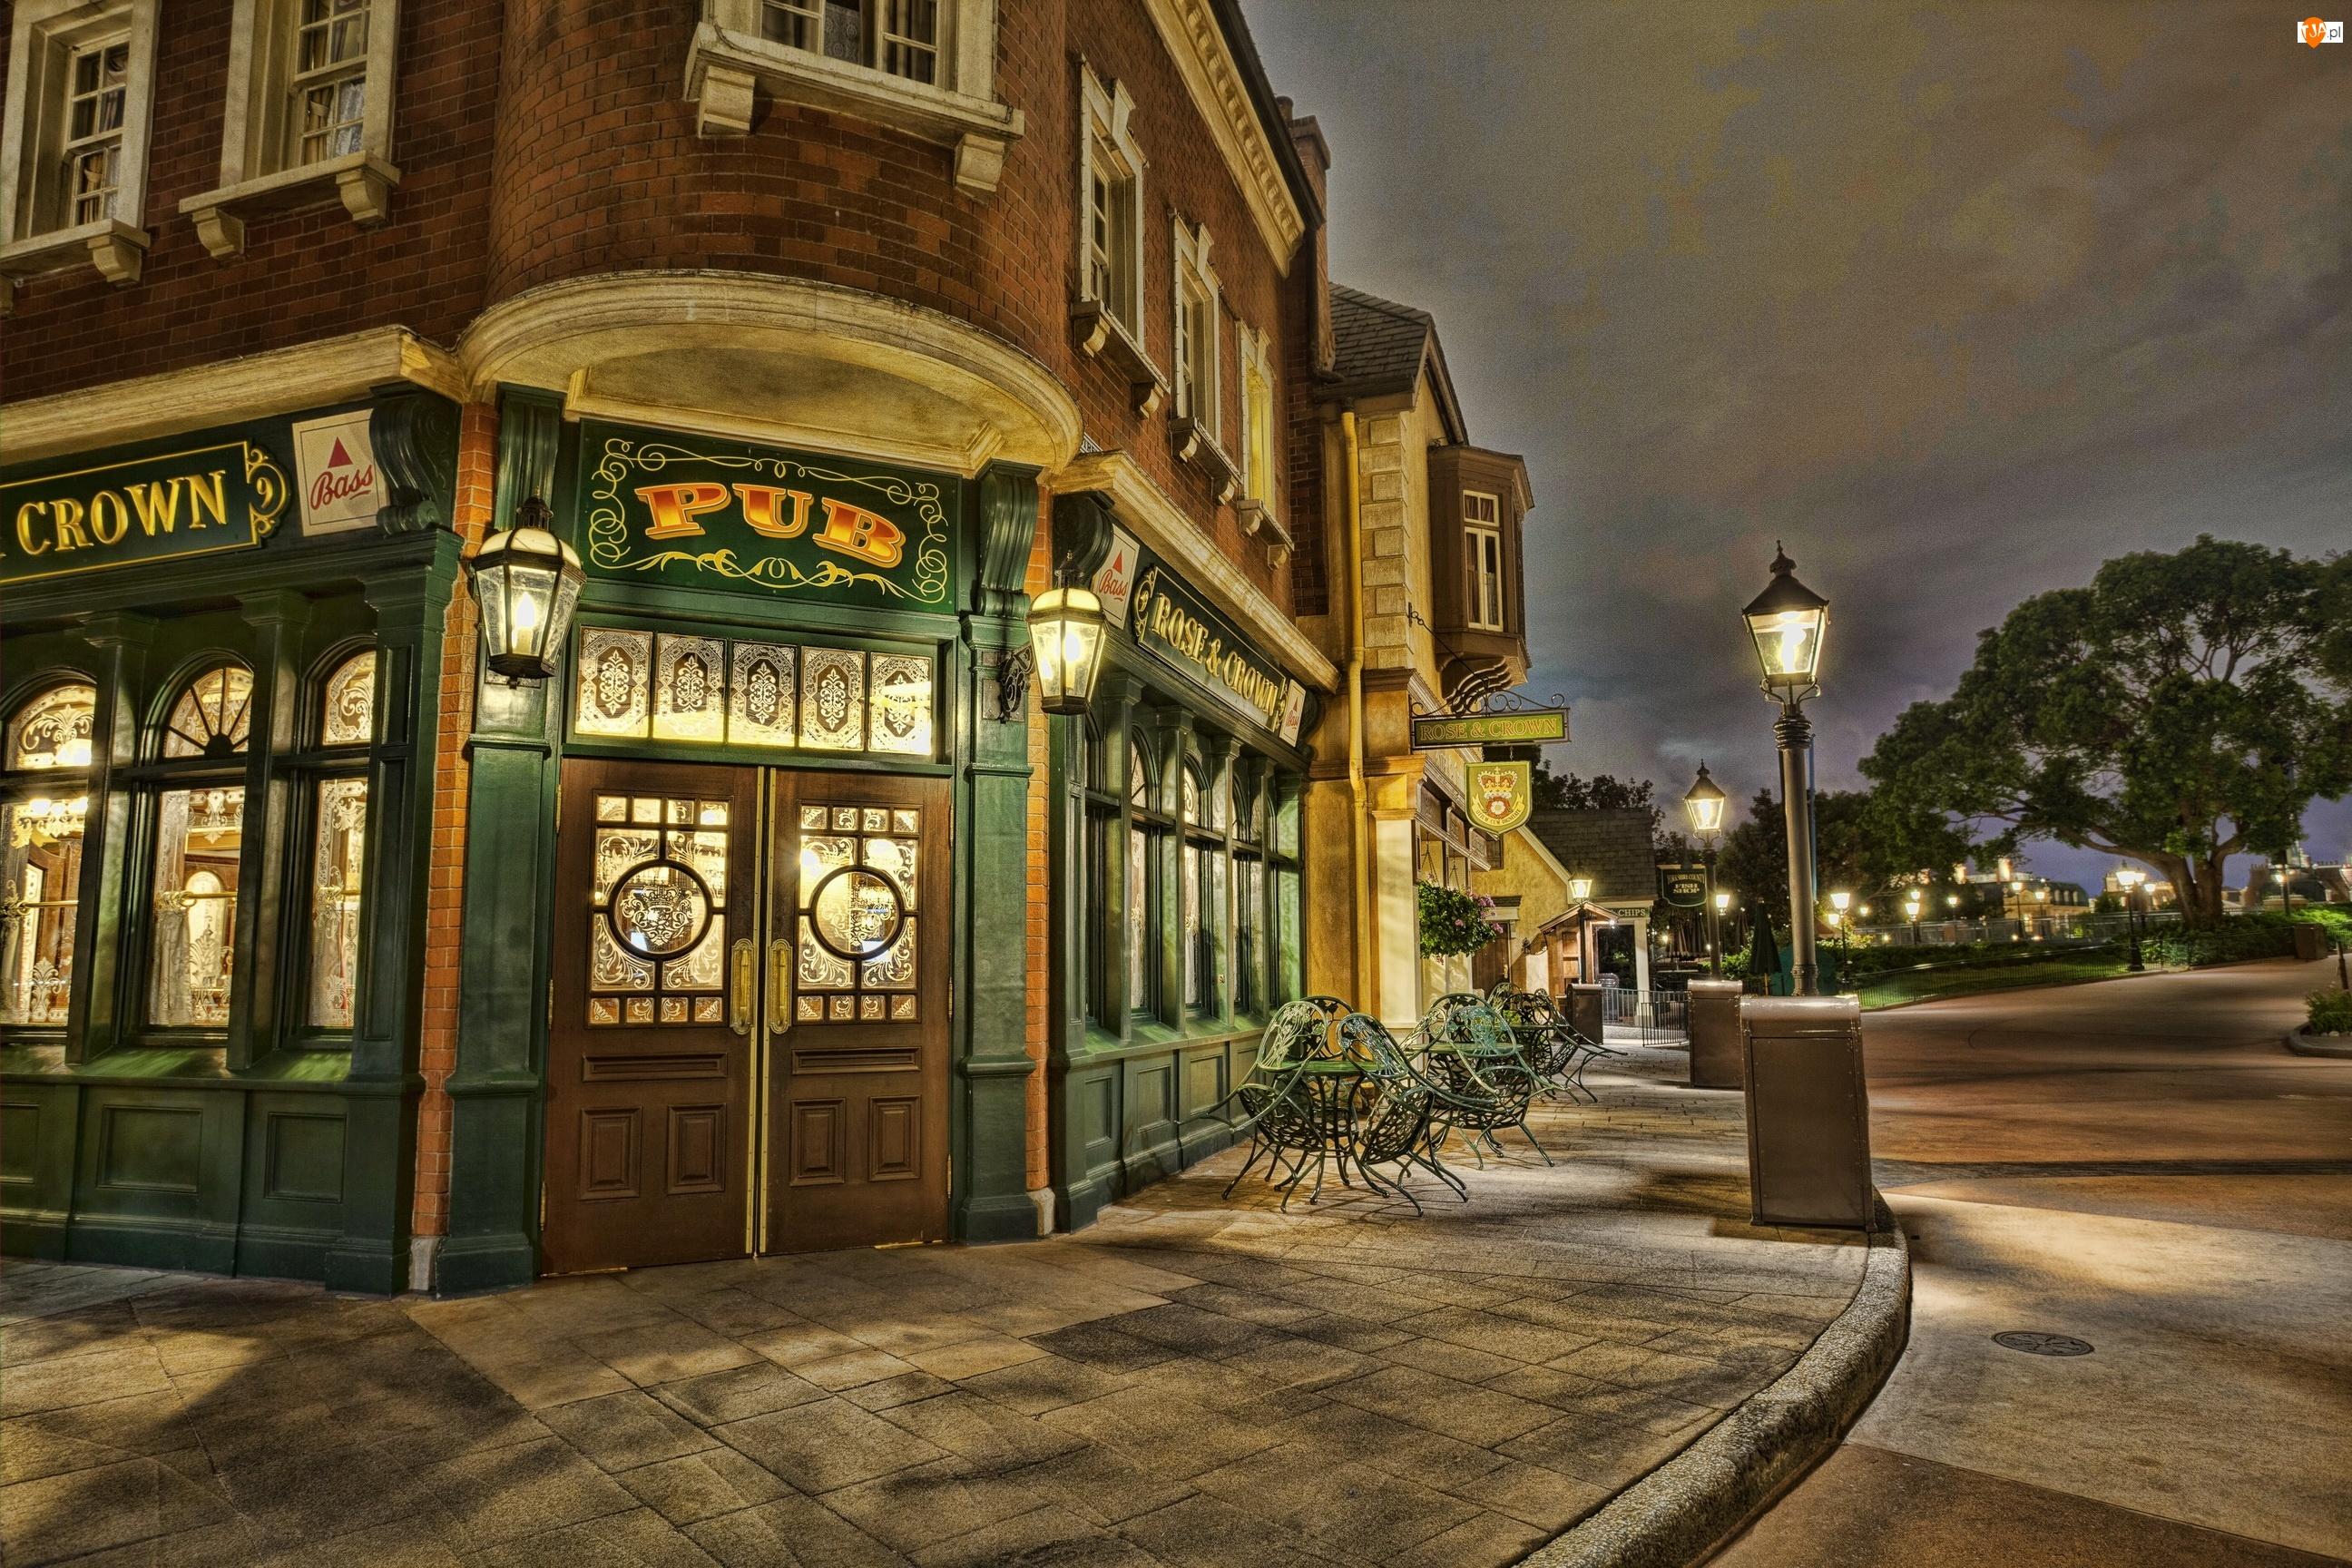 Stany Zjednoczone, Ulica, Floryda, Epcot, Orlando, Bar, Rose and Crown Pub, Dom, Disneyland